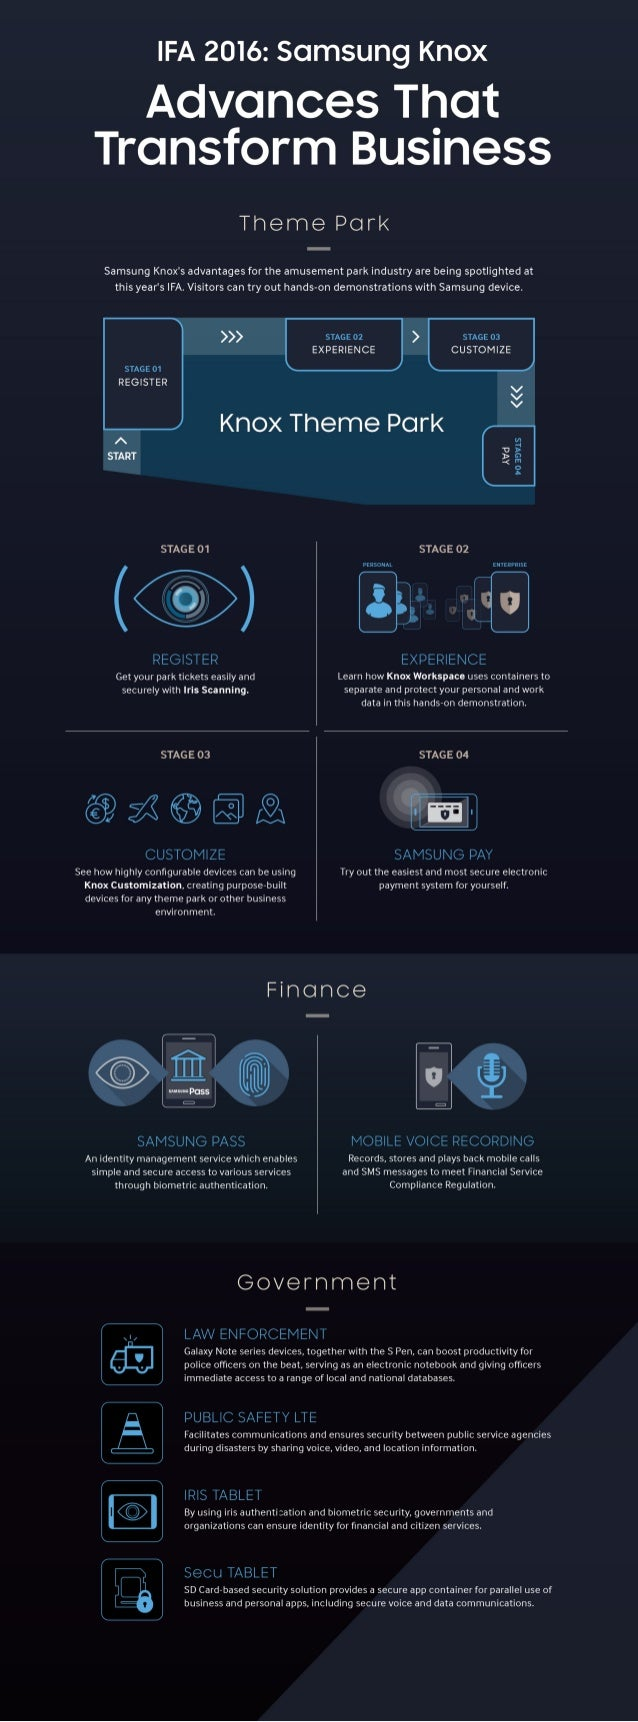 [Infographic] IFA 2016: Samsung Knox